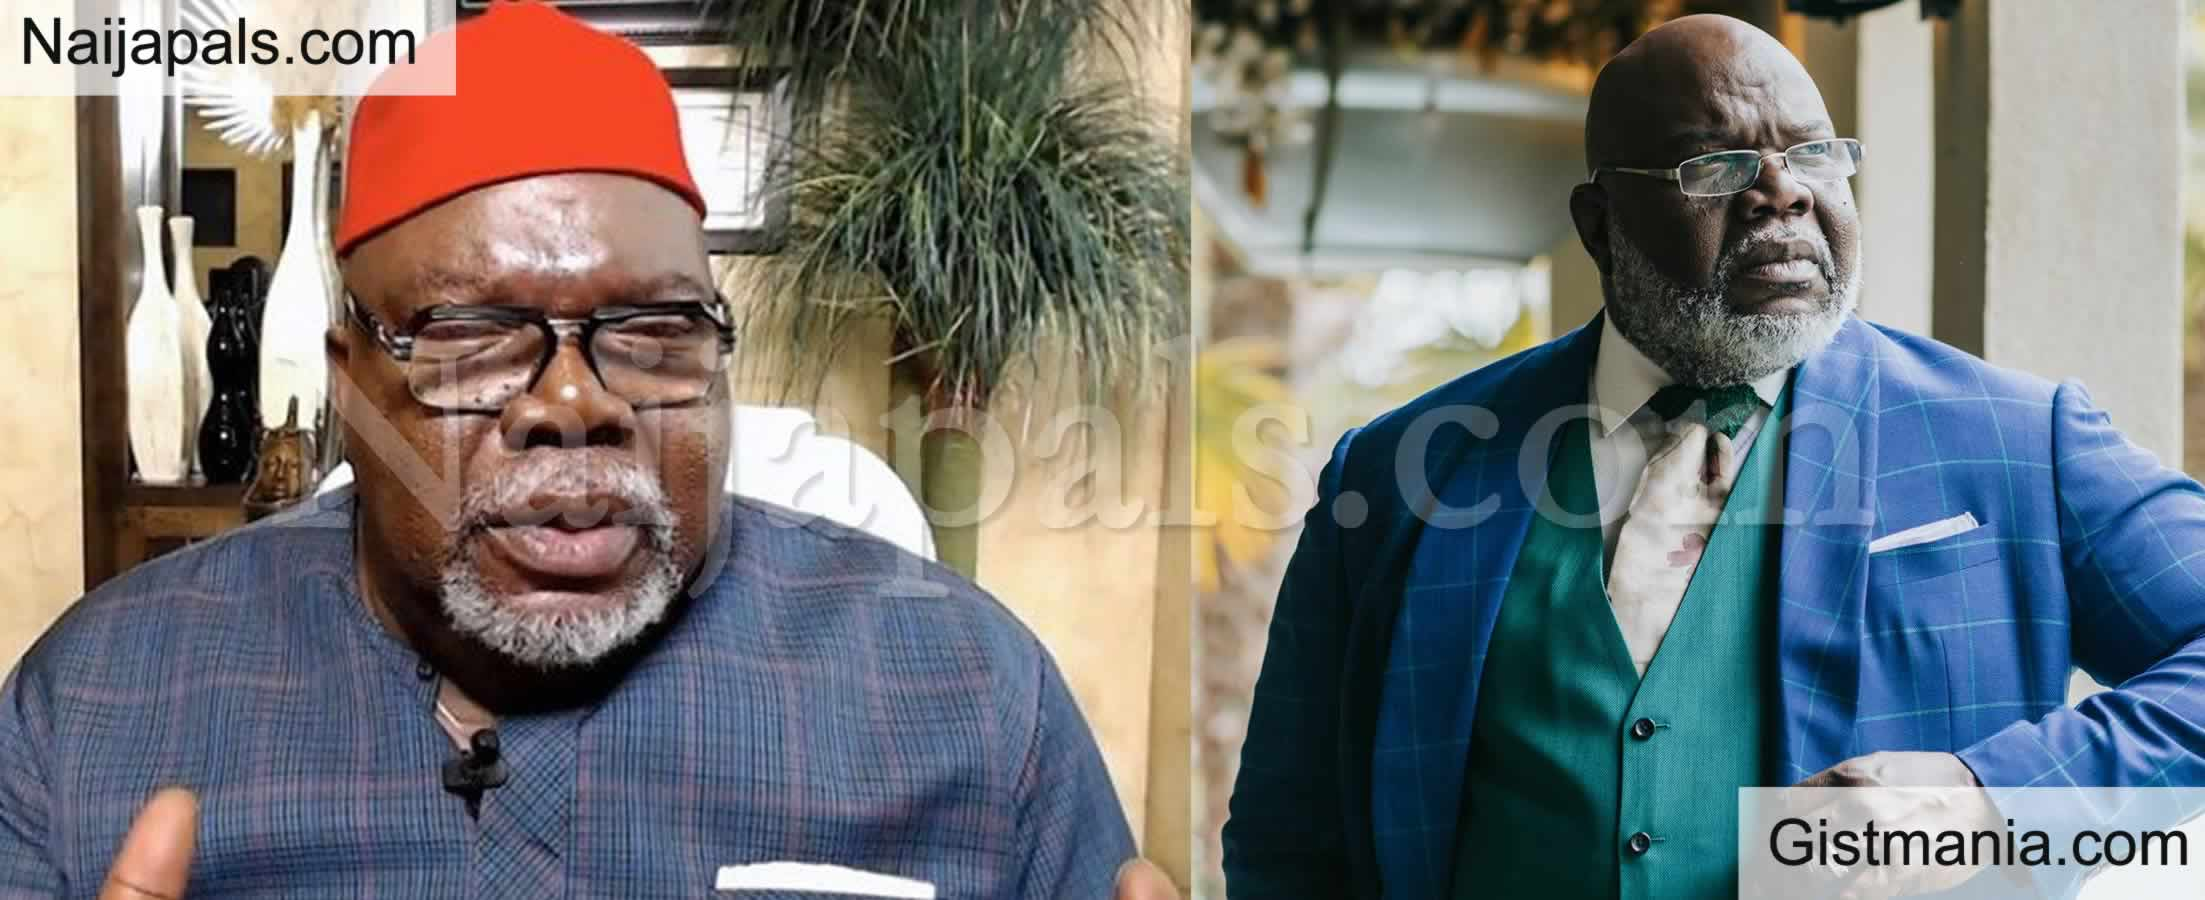 <img alt='.' class='lazyload' data-src='https://img.gistmania.com/emot/comment.gif' /> My Ancestors Were Igbos - <b>American Evangelist, Bishop T.D Jakes Confirms He is a Nigerian</b>